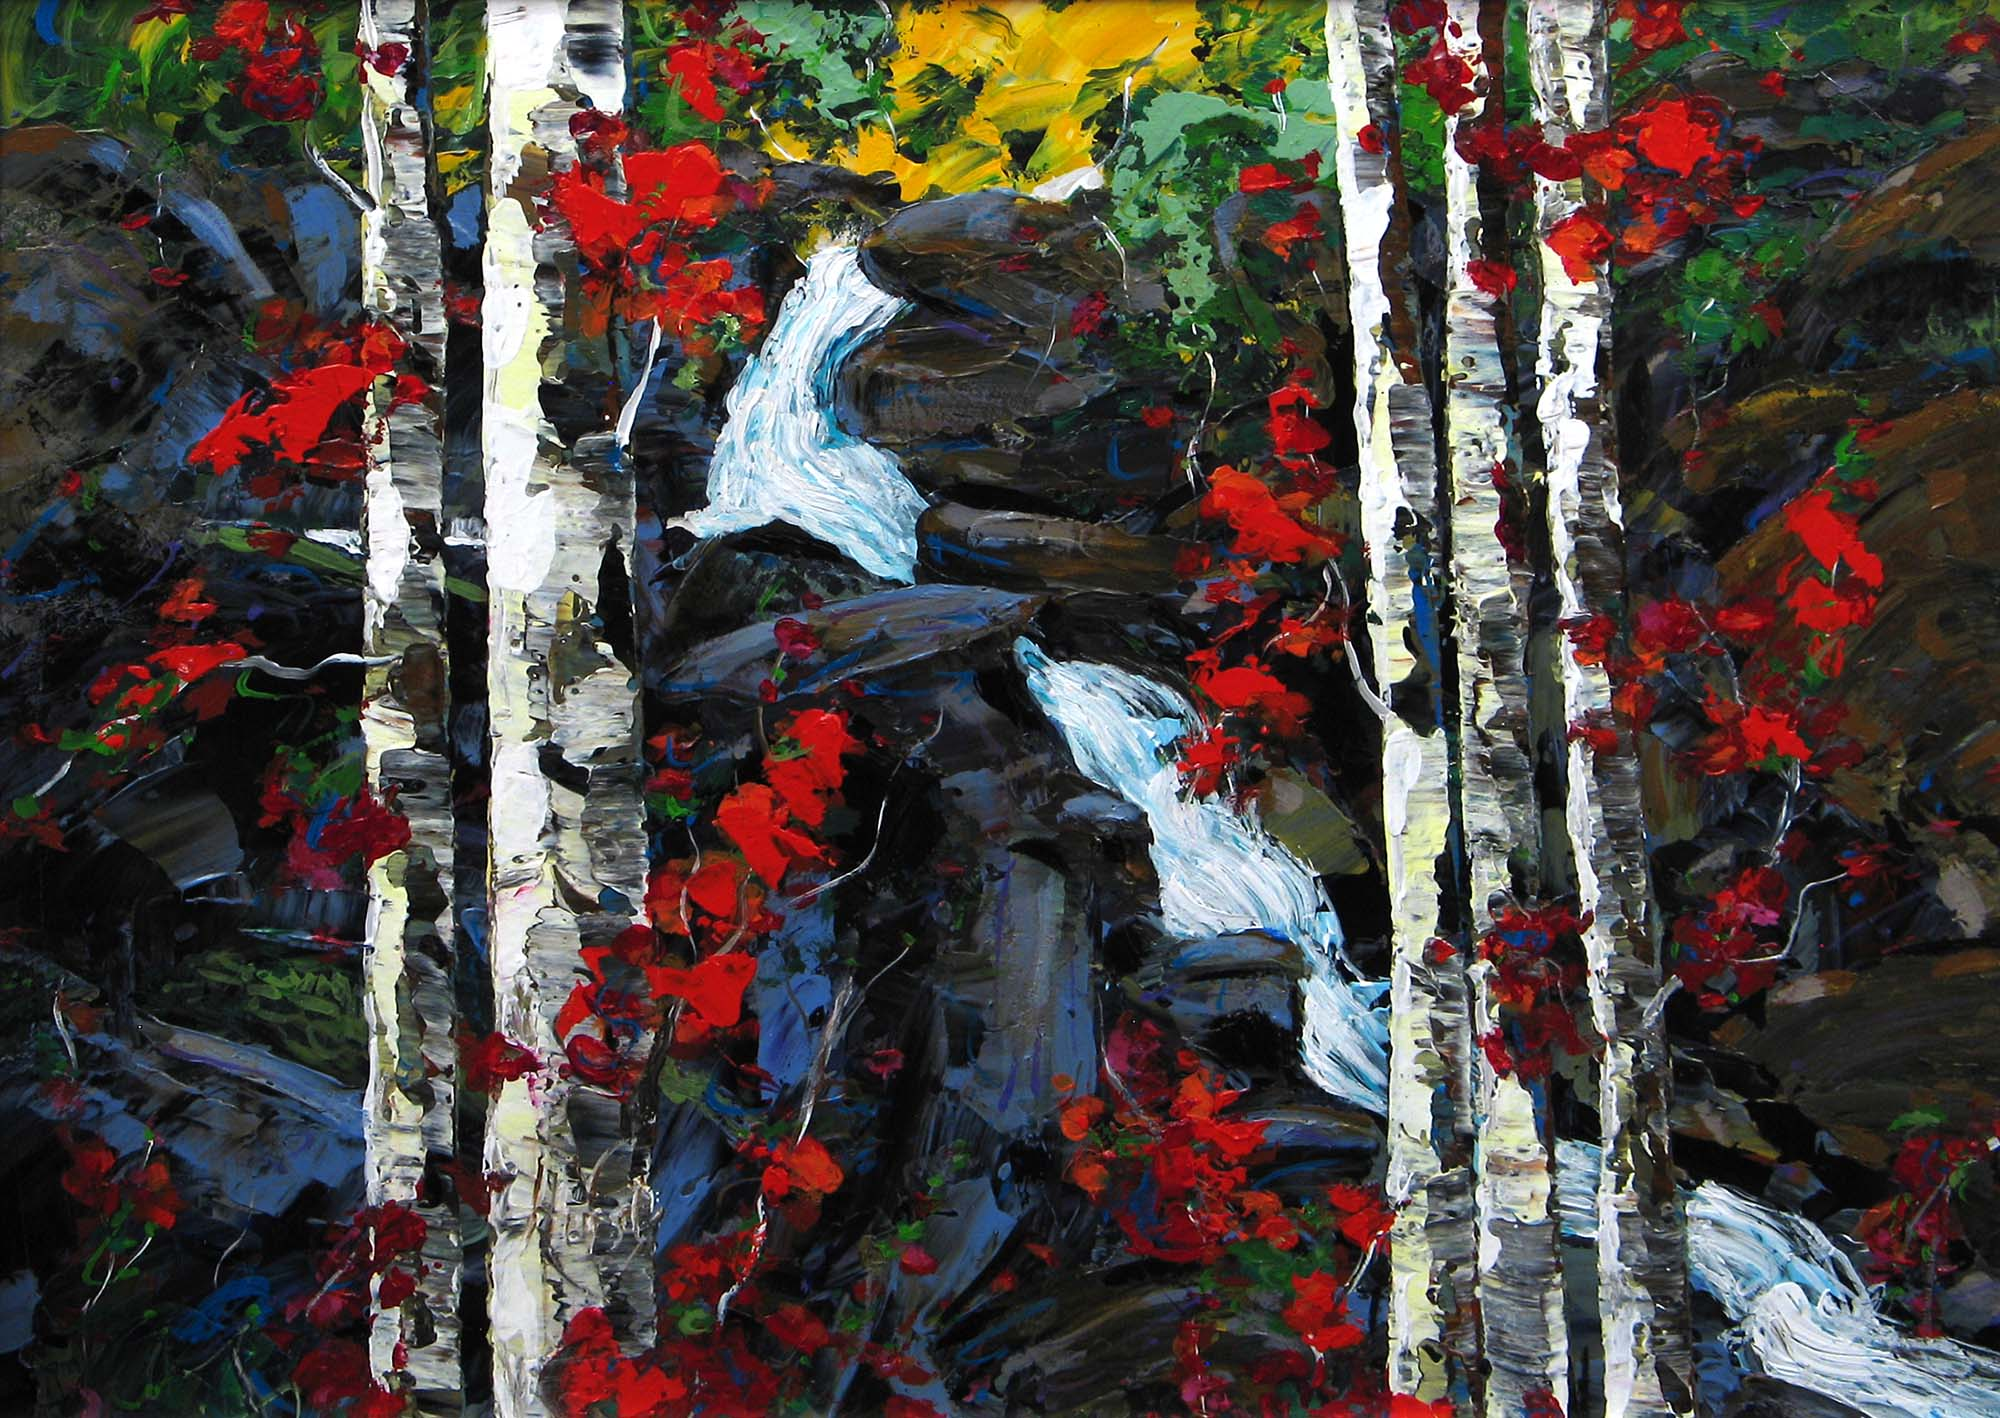 West Coast Wild - Marilyn Hurst